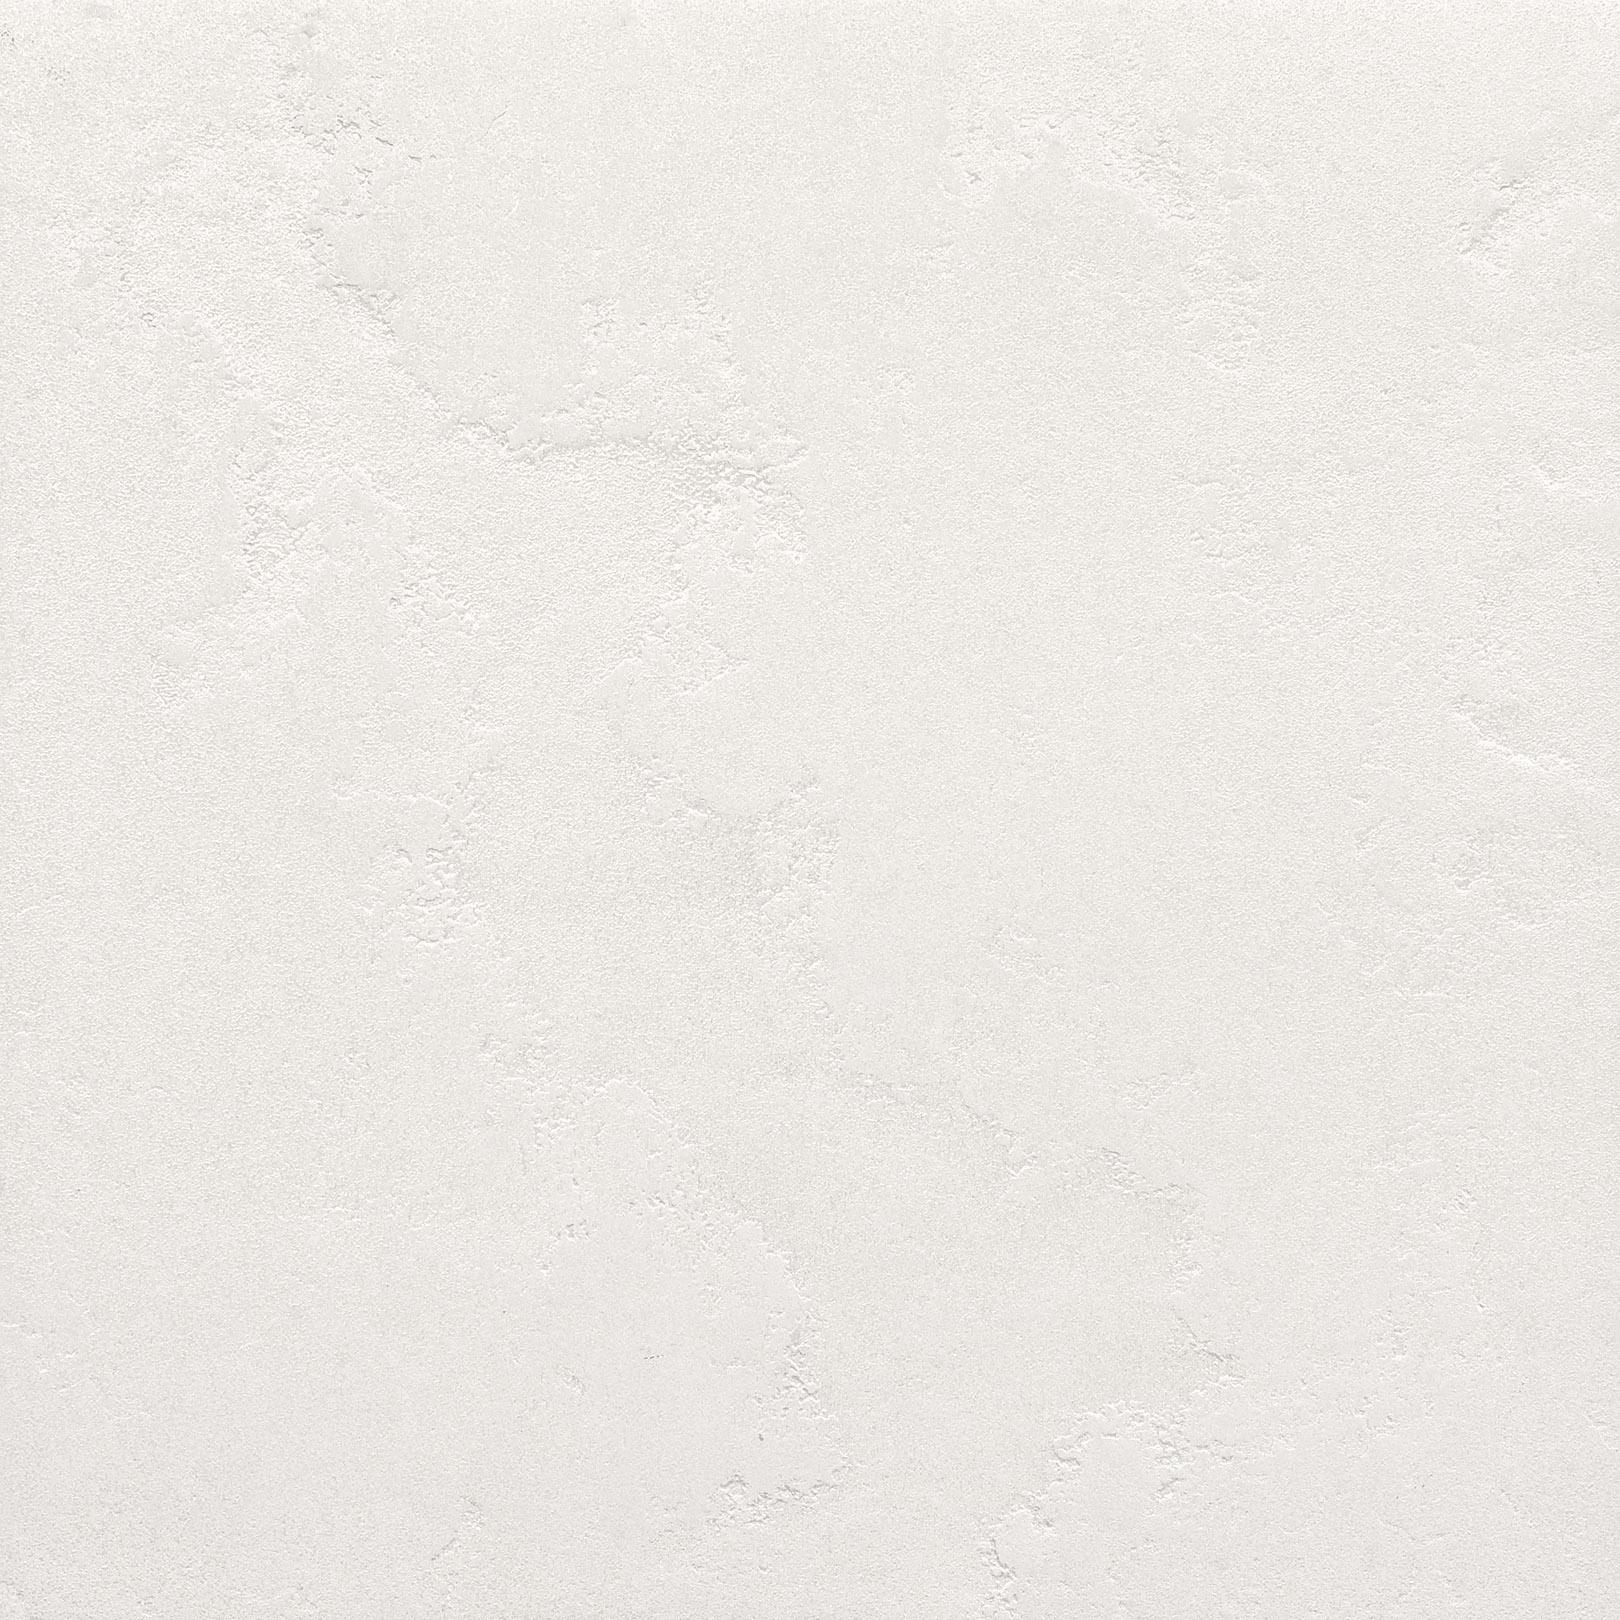 Bianco Porcelain Tile: View The Bianco Porcelain Tile From Porcelain Tiles Ltd